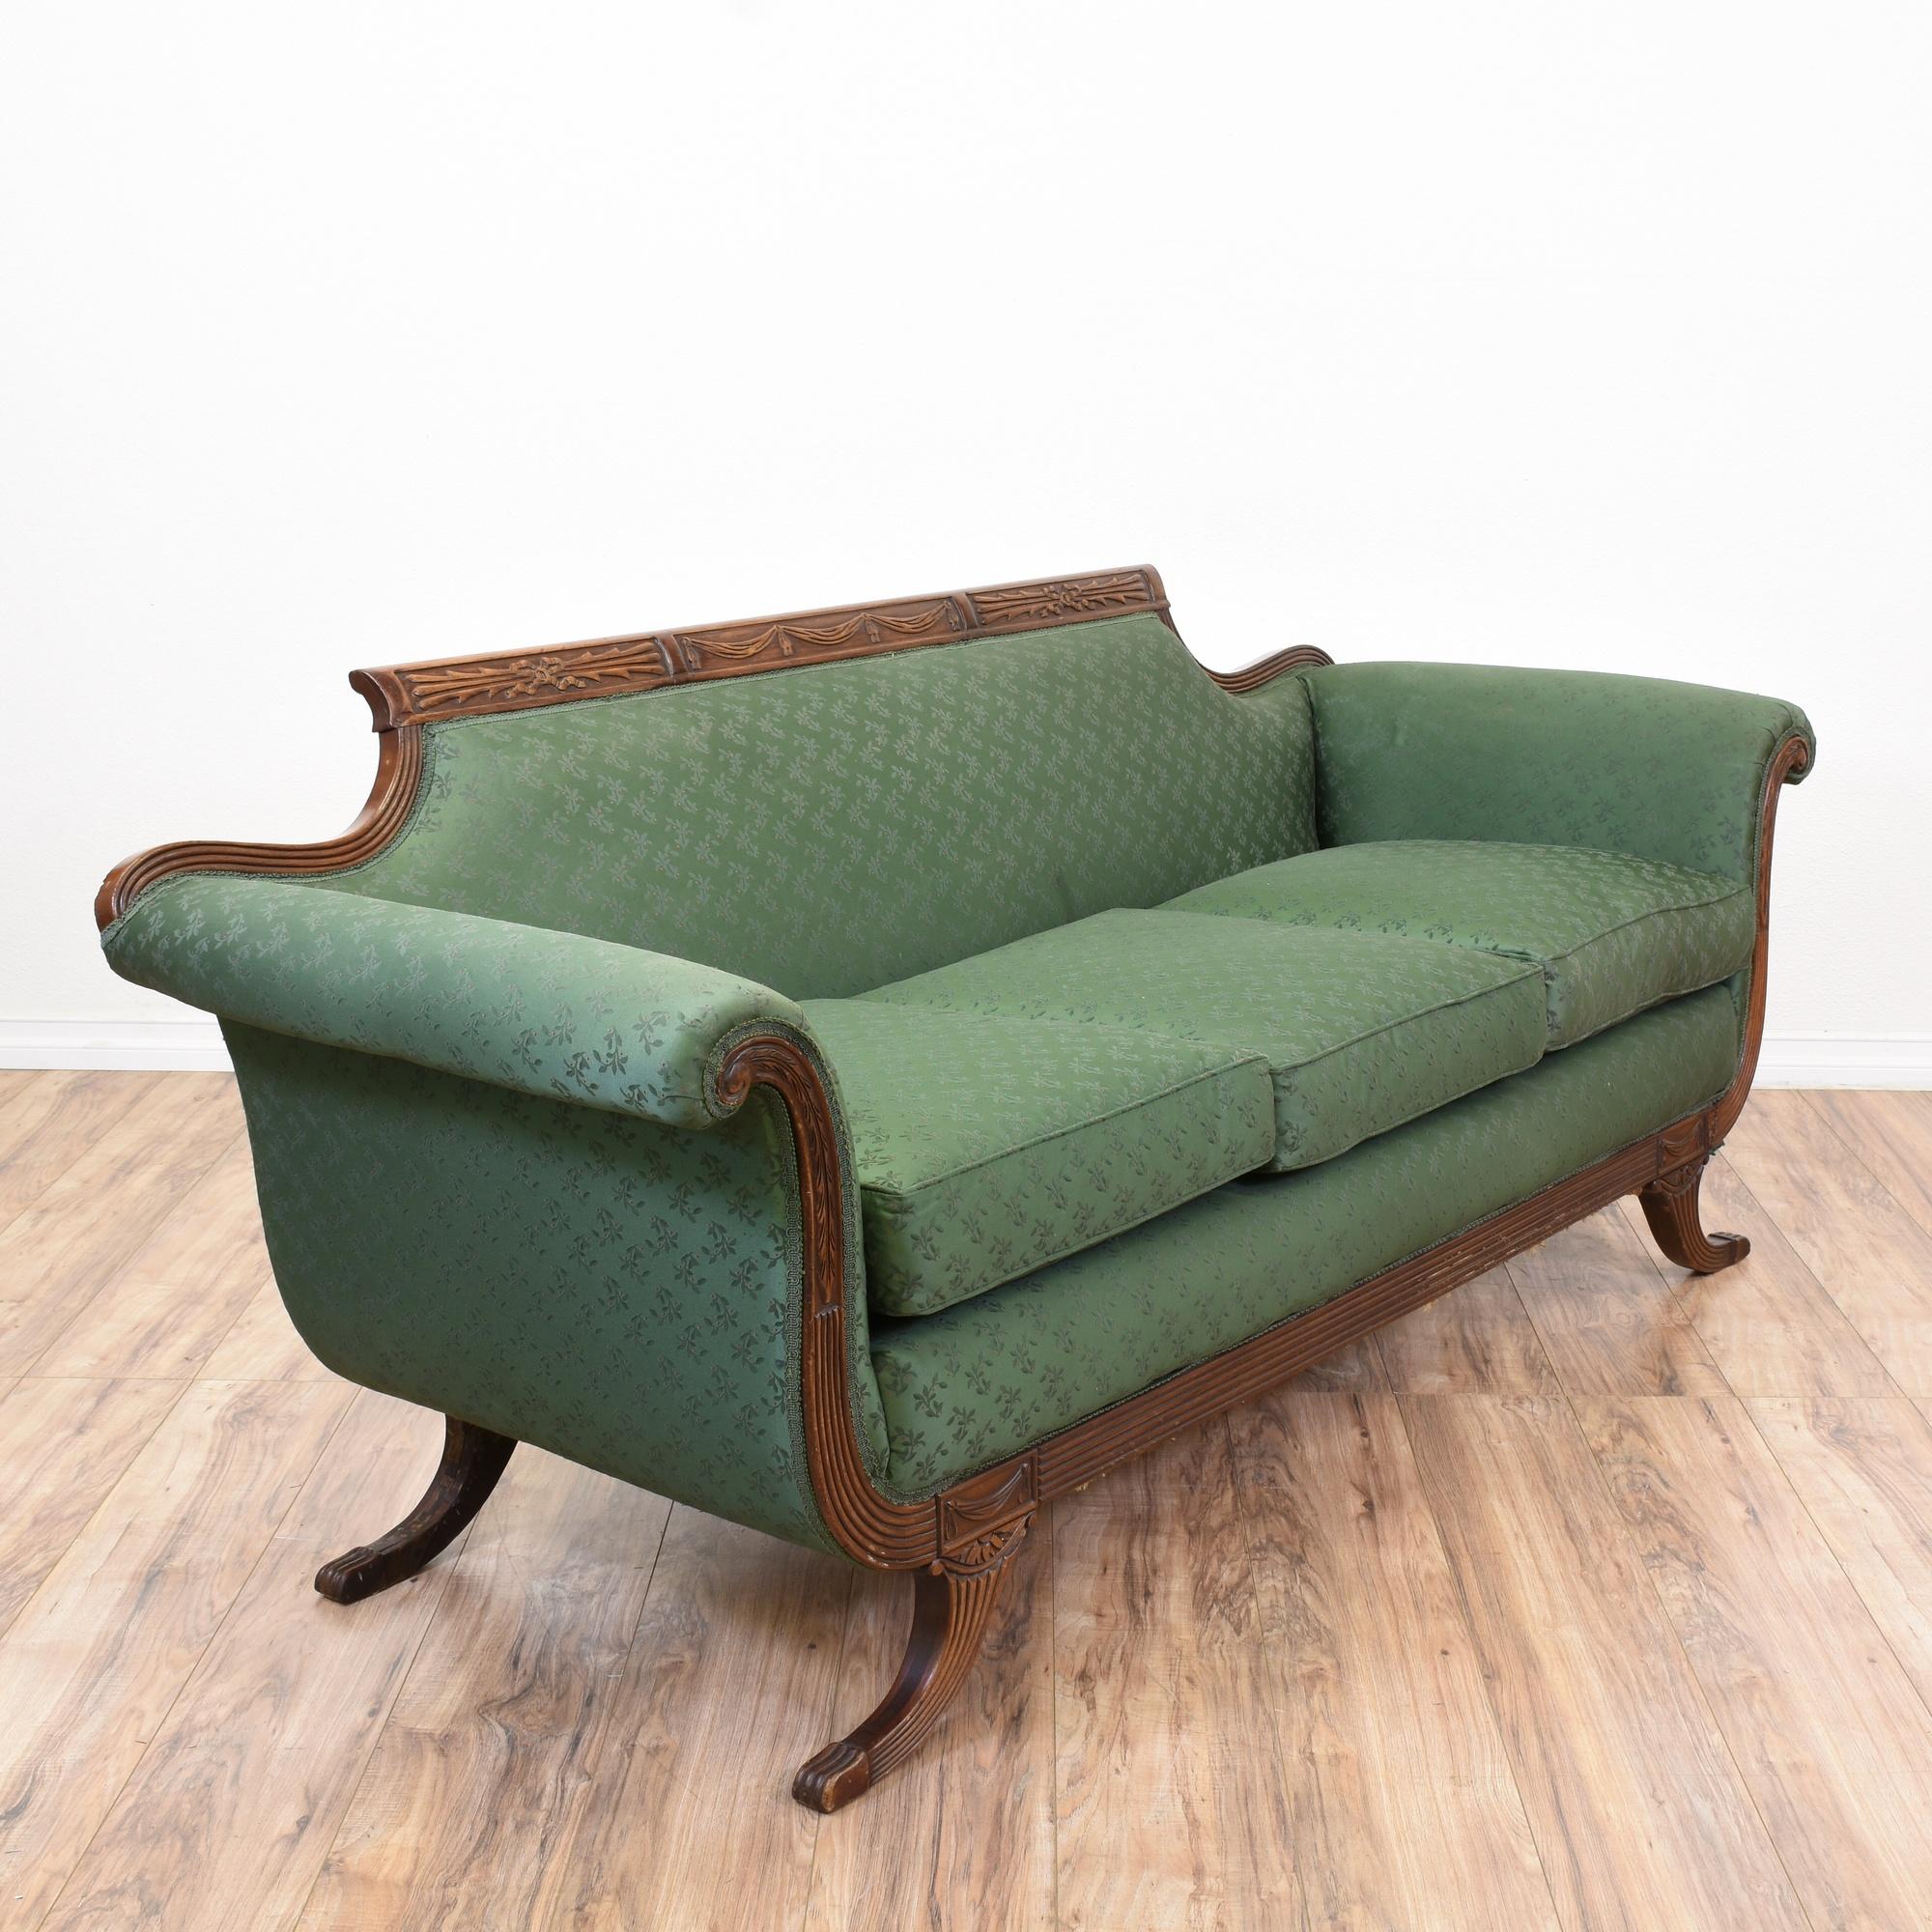 Antique Sofa Duncan Phyfe: Floral Green Duncan Phyfe Inspired Sofa